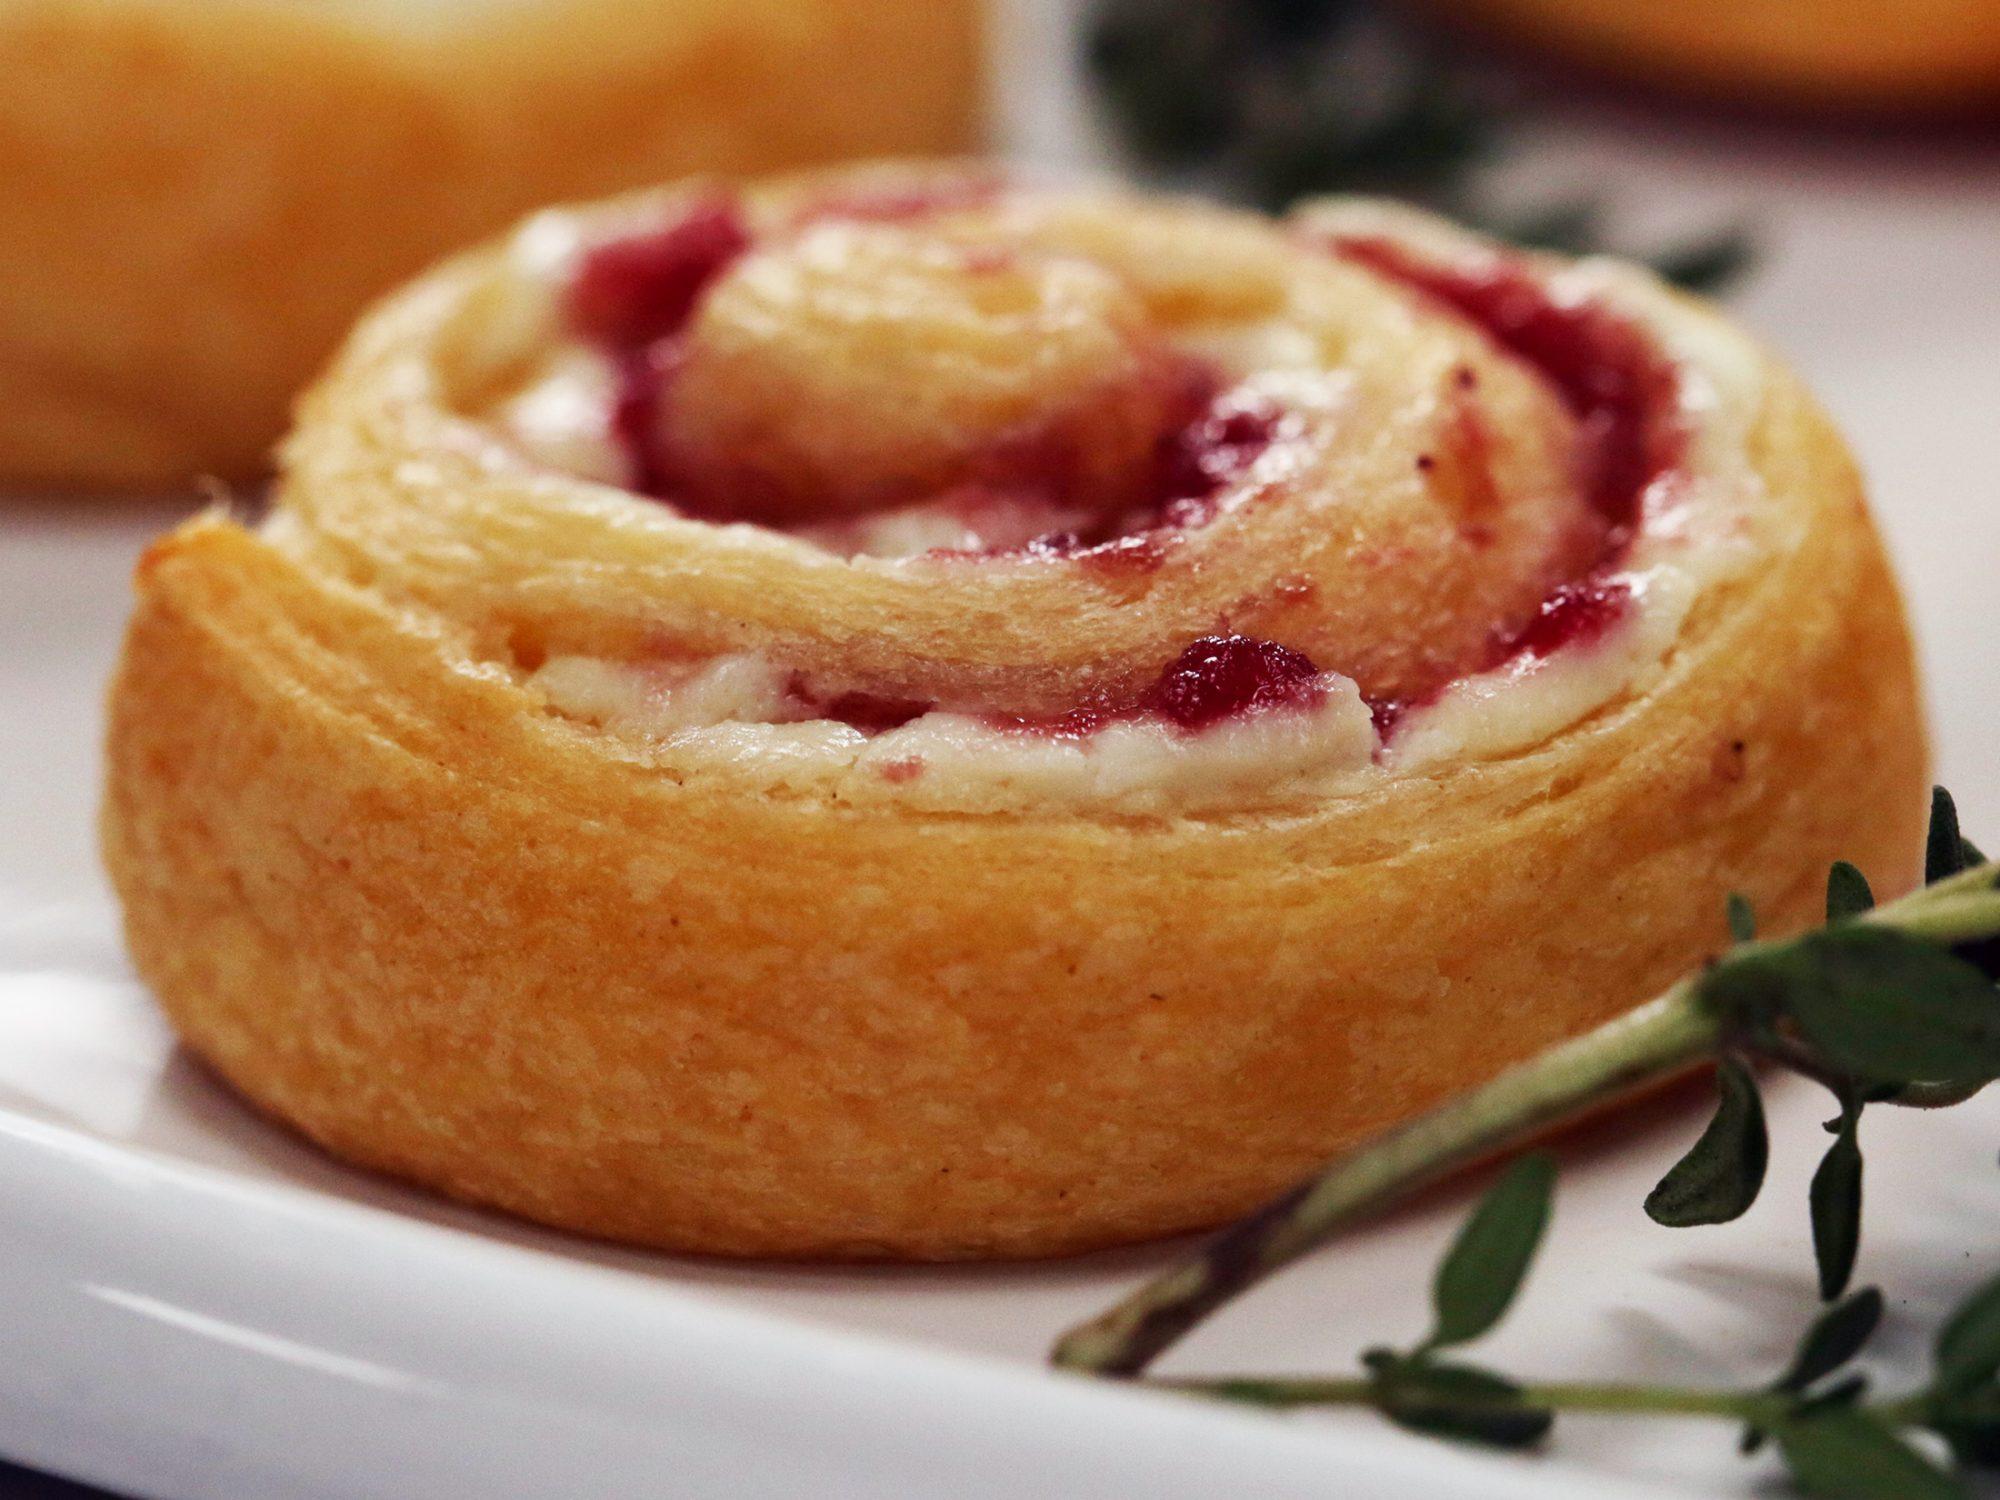 Cranberry-Goat Cheese Pinwheels